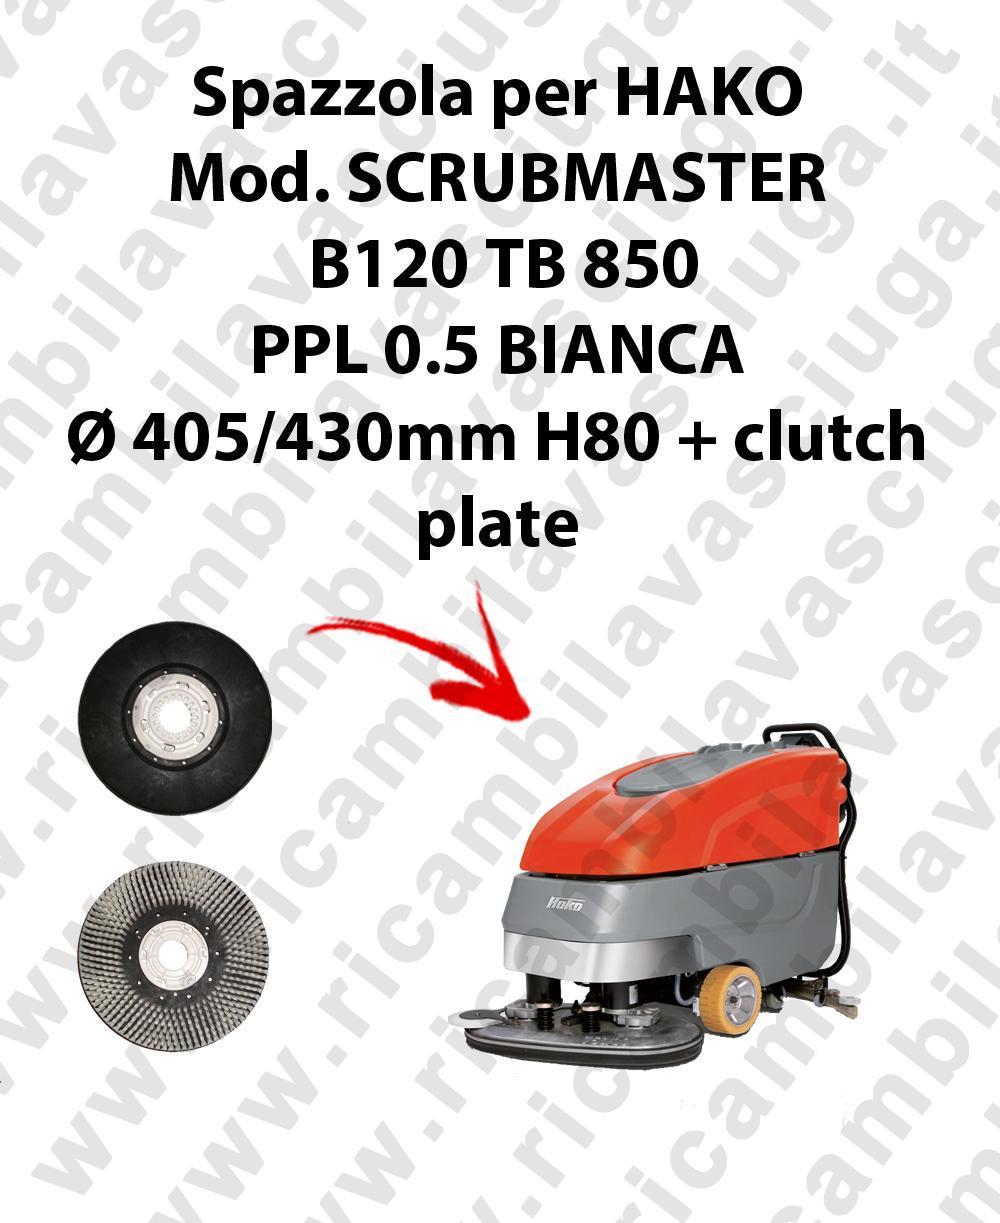 BROSSE A LAVER pour autolaveuses HAKO Reference SCRUBMASTER B120 TB 850